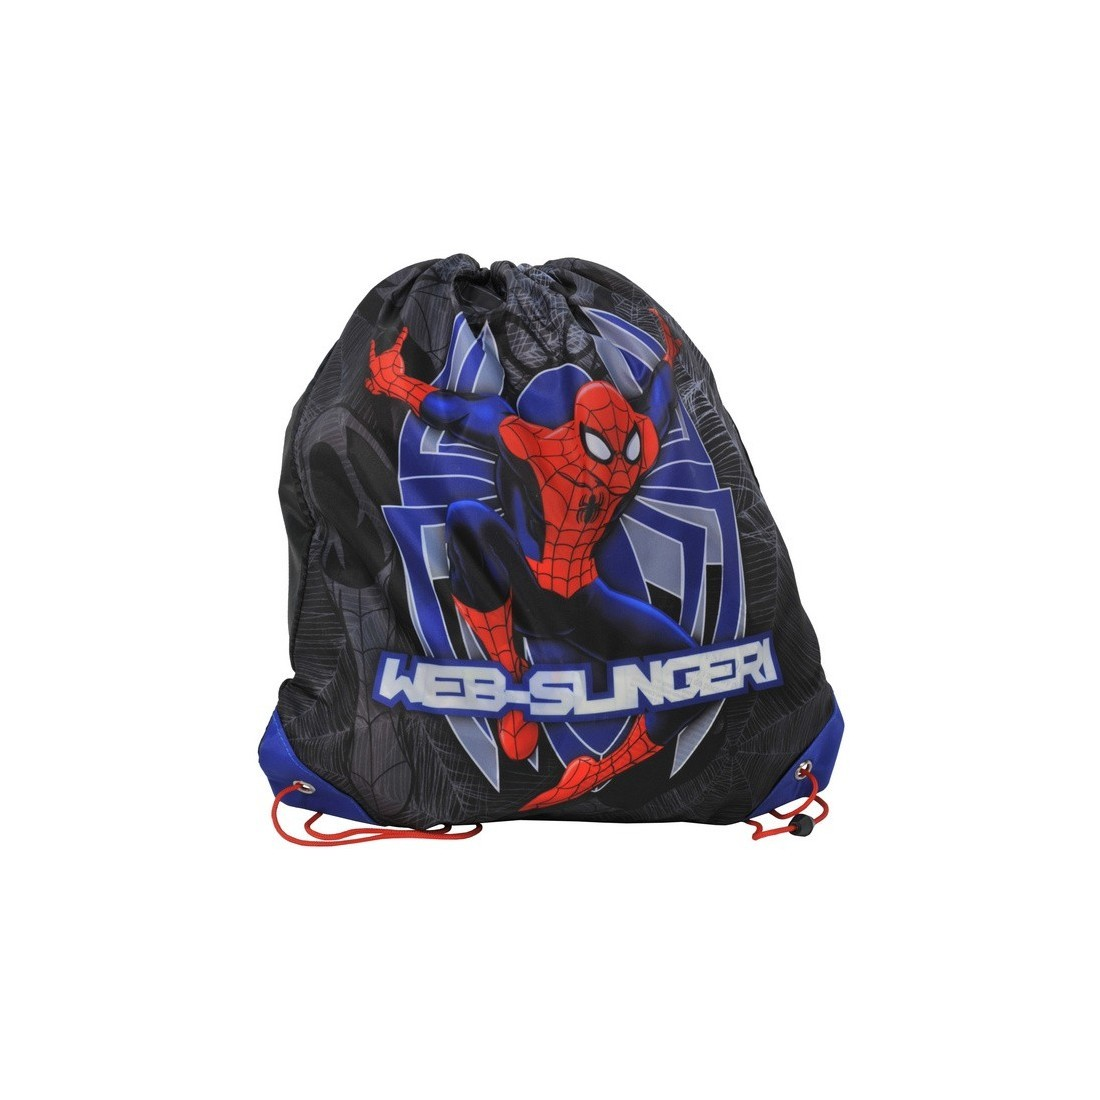 Worek szkolny Spider-Man - plecak-tornister.pl